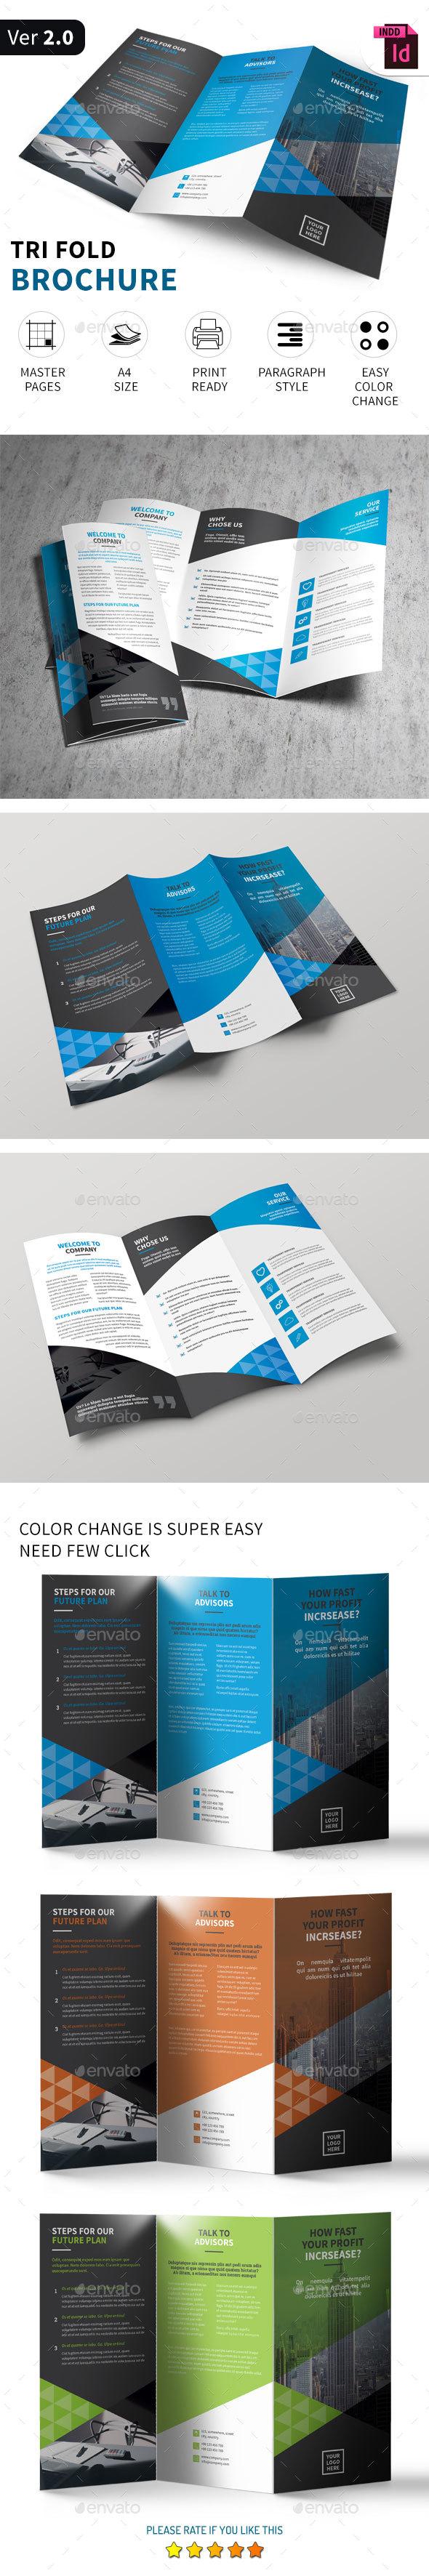 Tri-fold Brochure Vol.6 - Corporate Brochures